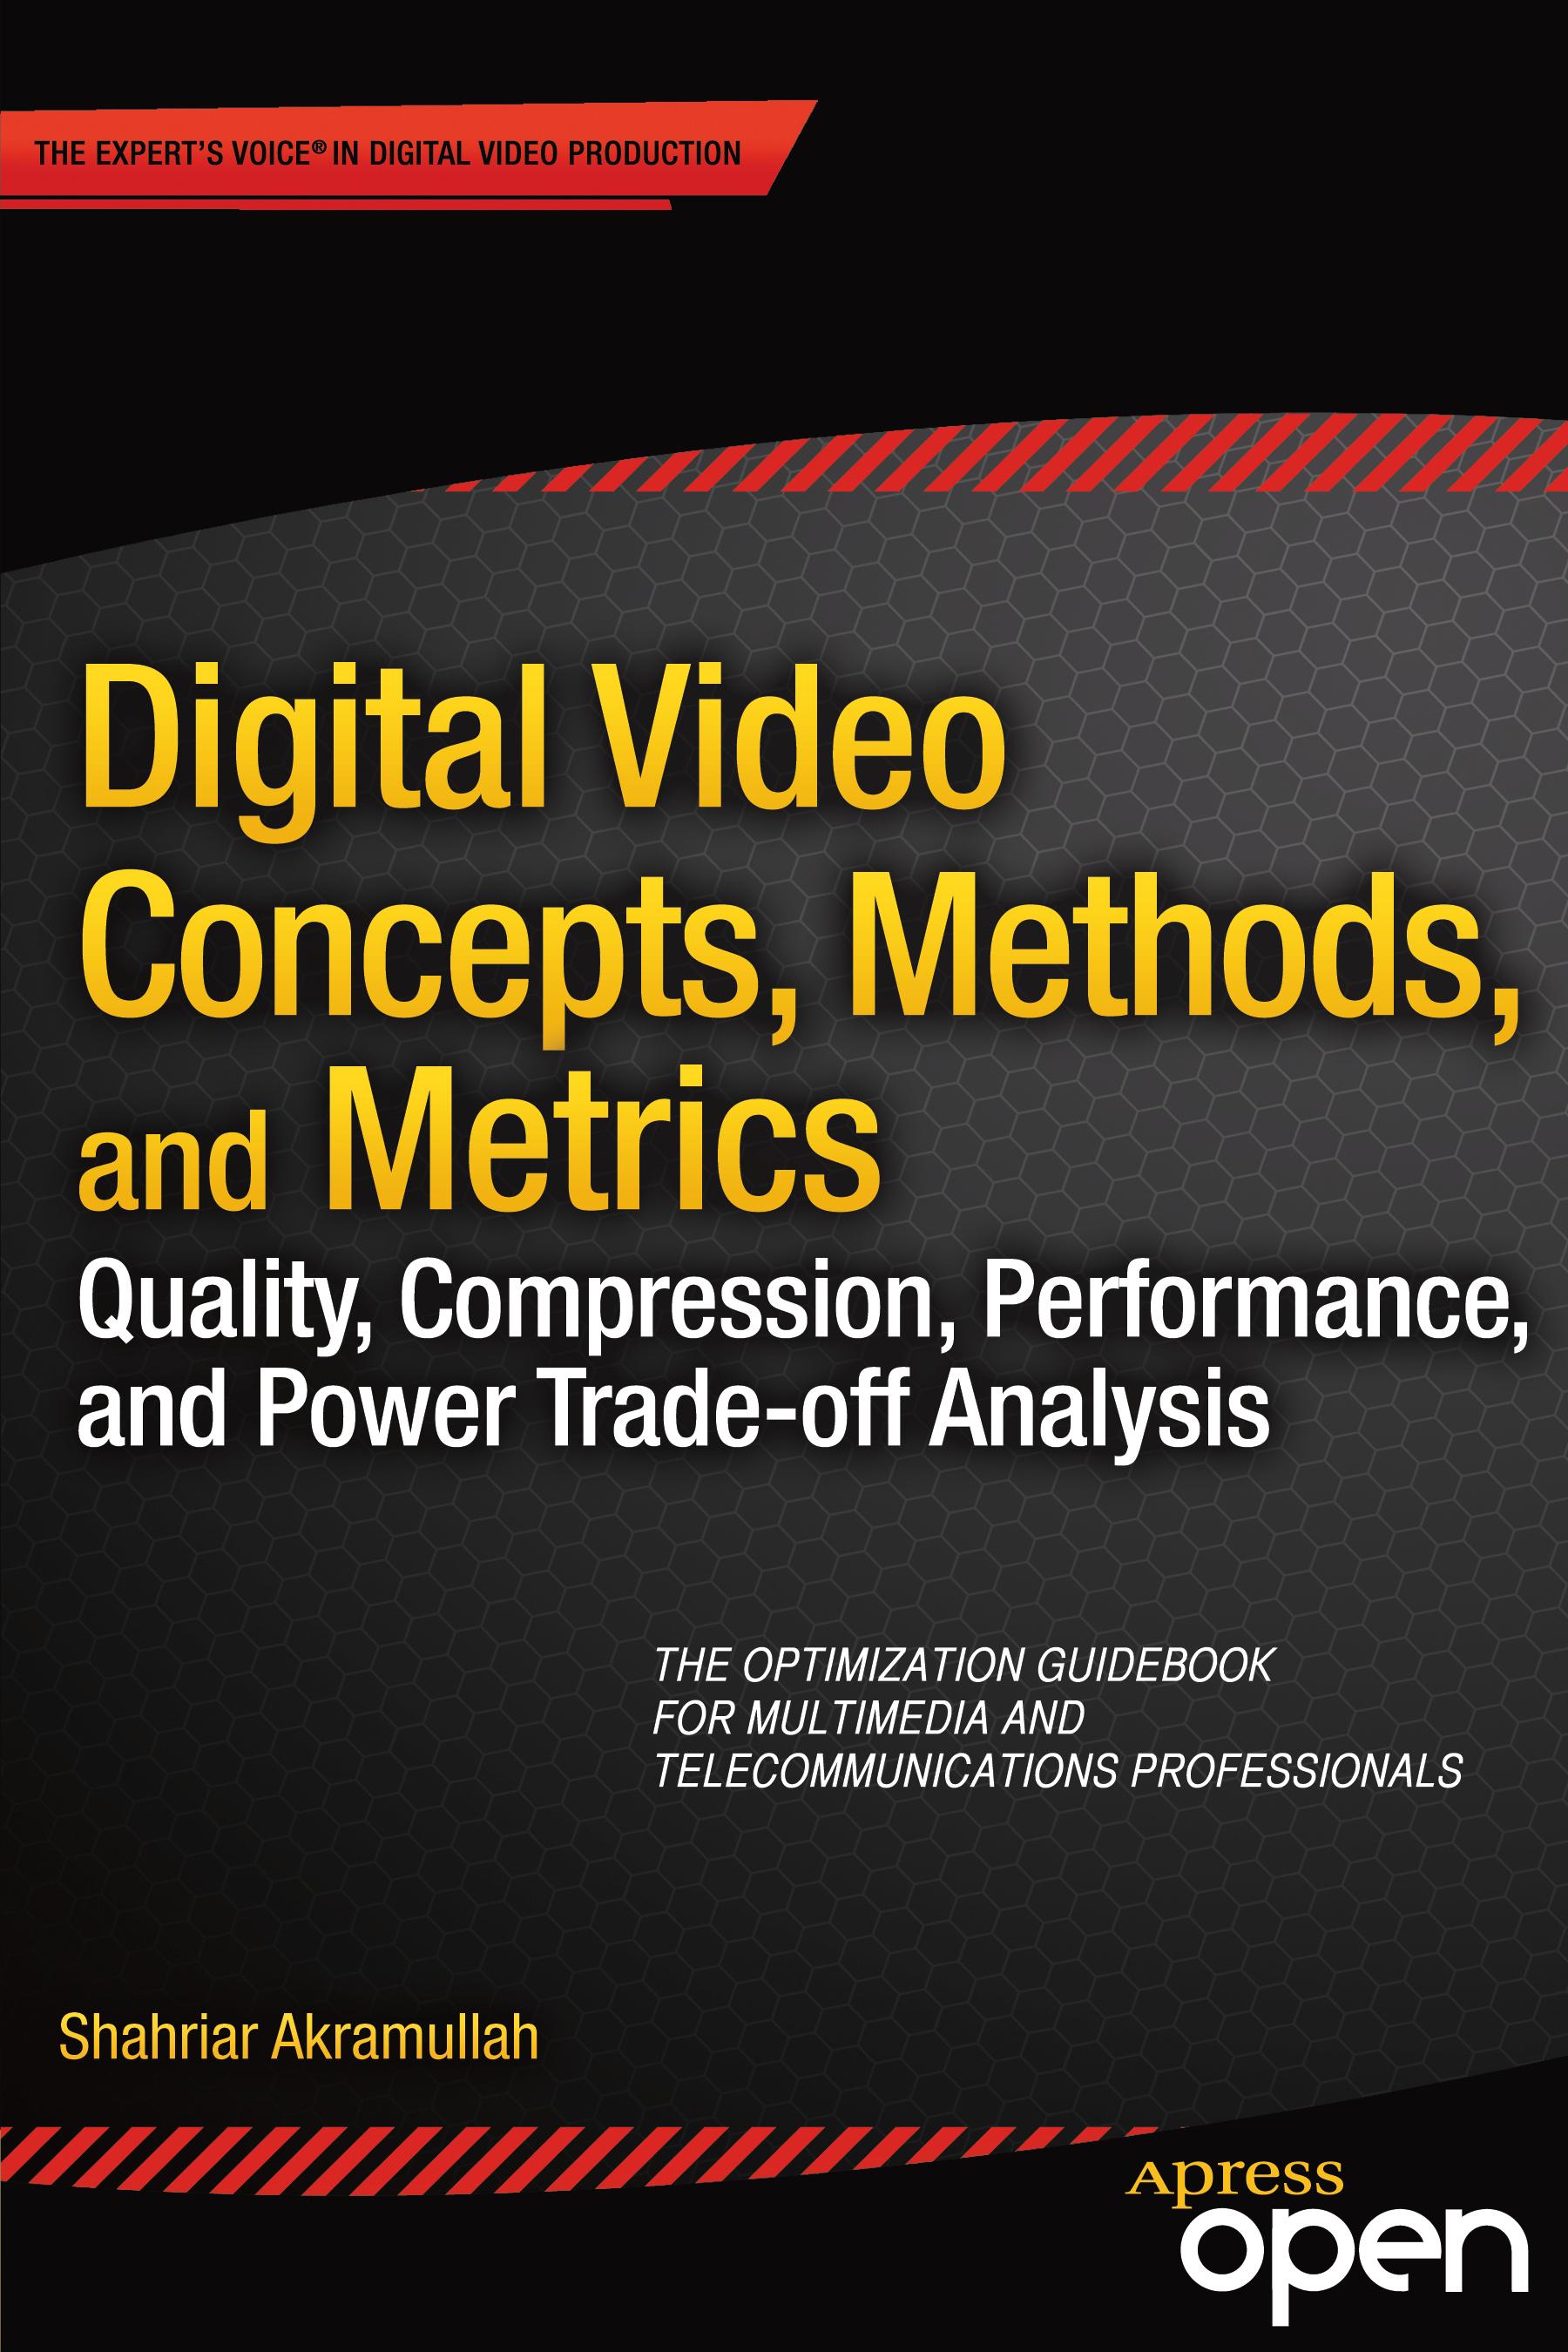 Akramullah, Shahriar - Digital Video Concepts, Methods, and Metrics, ebook